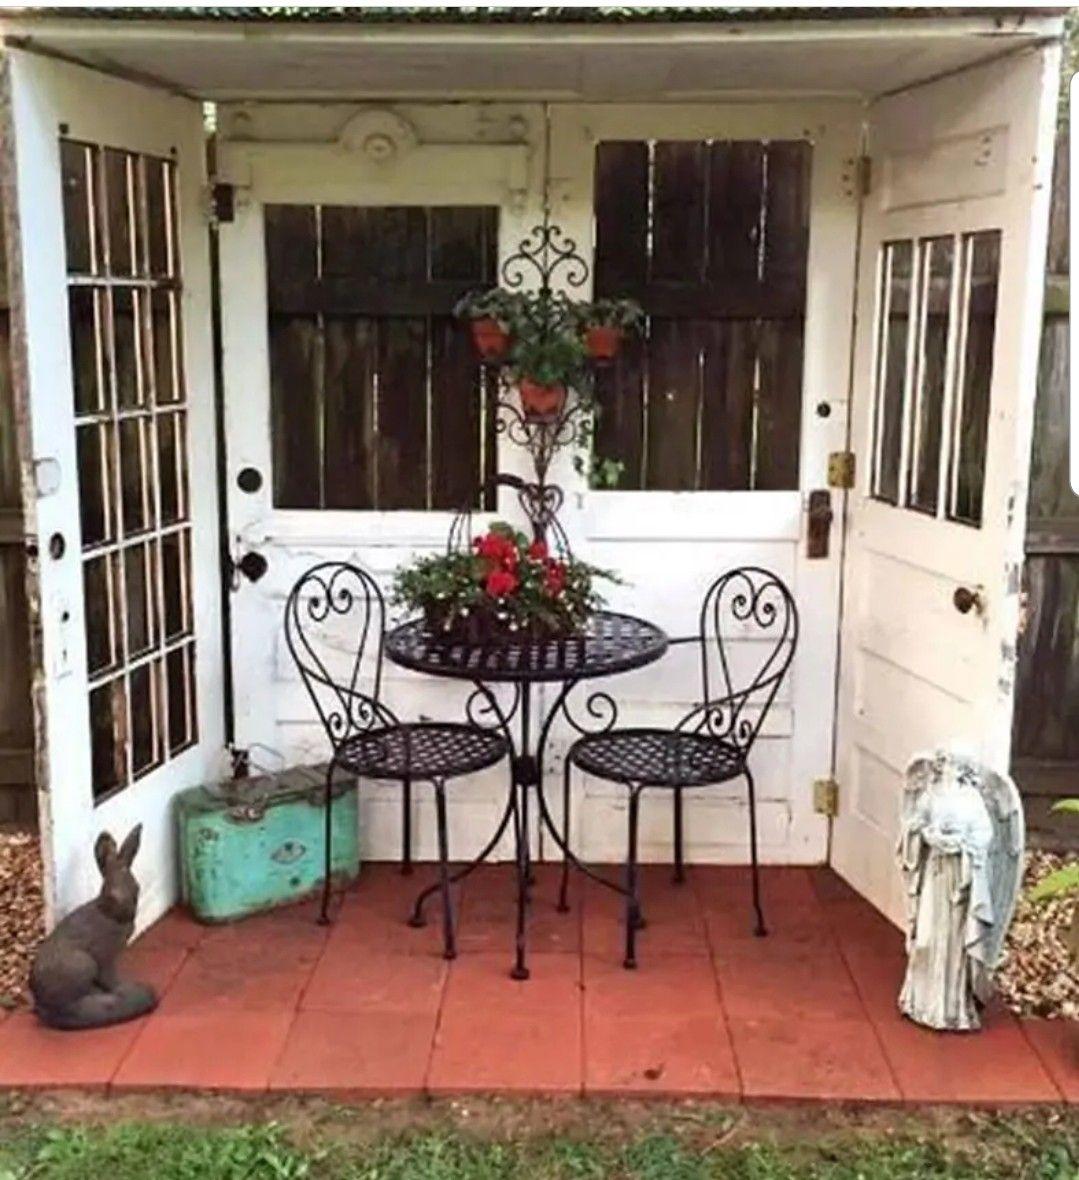 Pin by Christina Rivera on Back Yard Pleasures! | Backyard ... on Cheap Back Garden Ideas id=32940